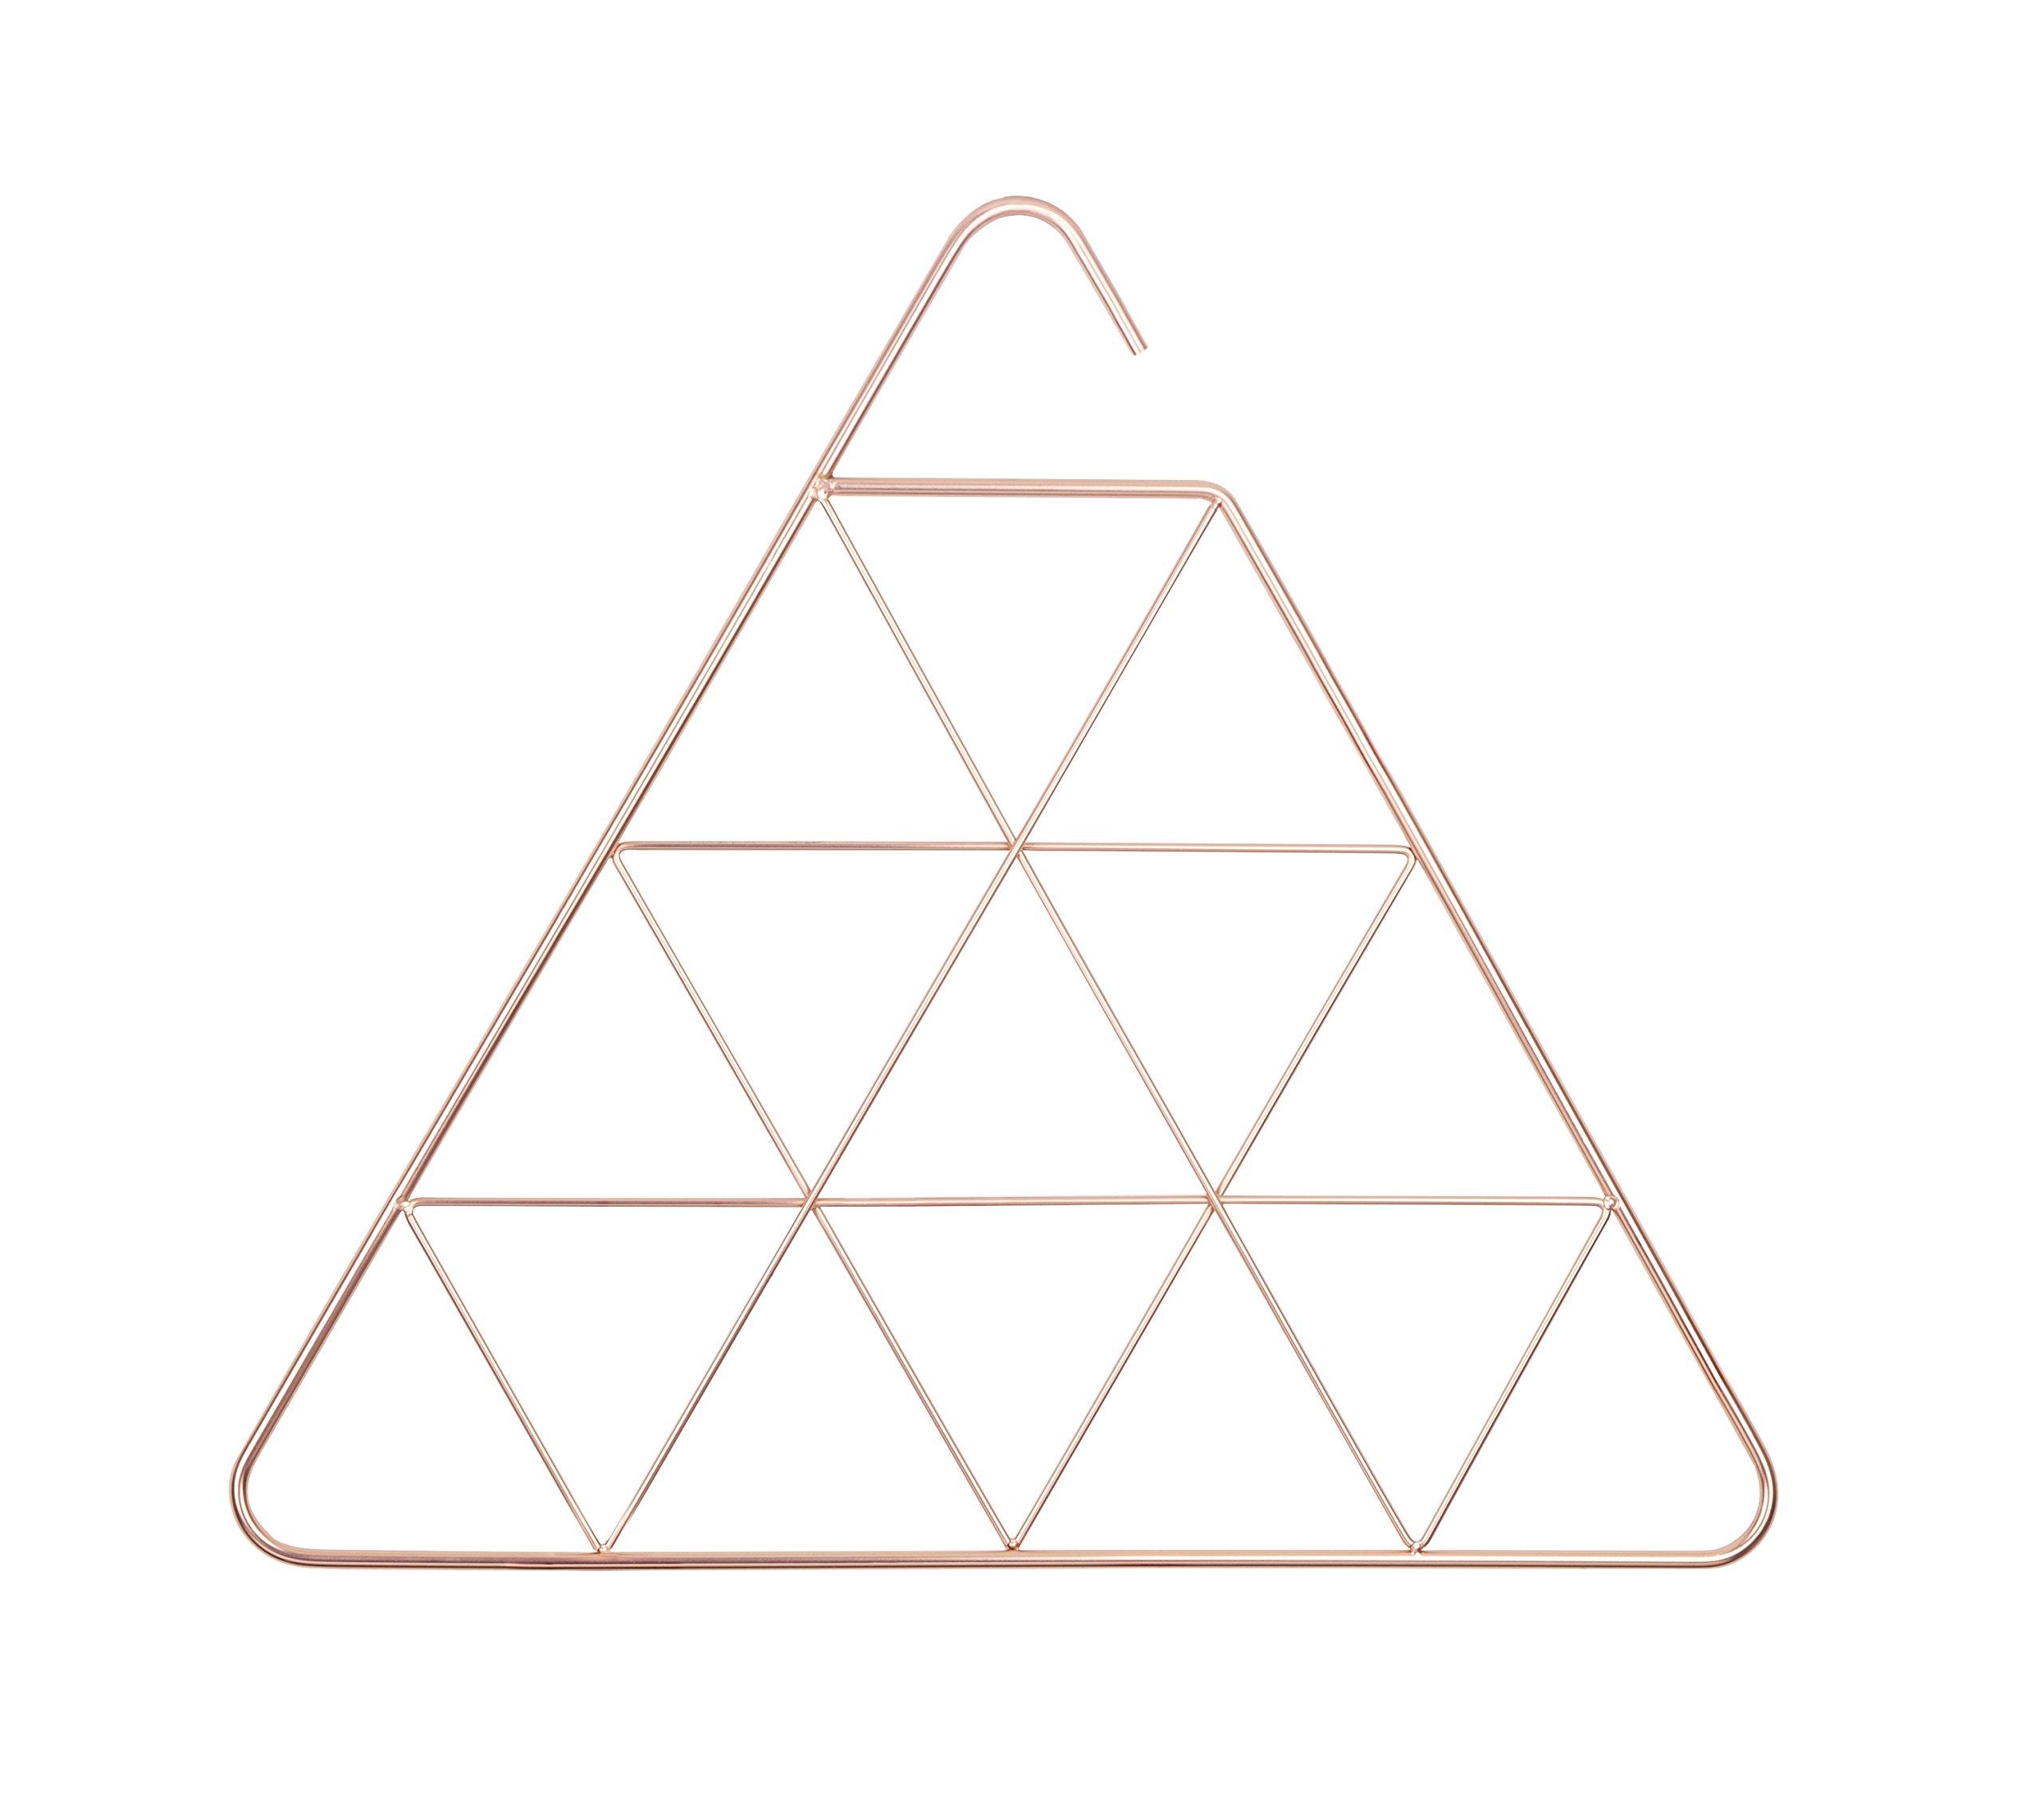 Umbra Pendant Triangular Copper Scarf Hanger/Accessory Hanger, Copper by Umbra (Image #1)